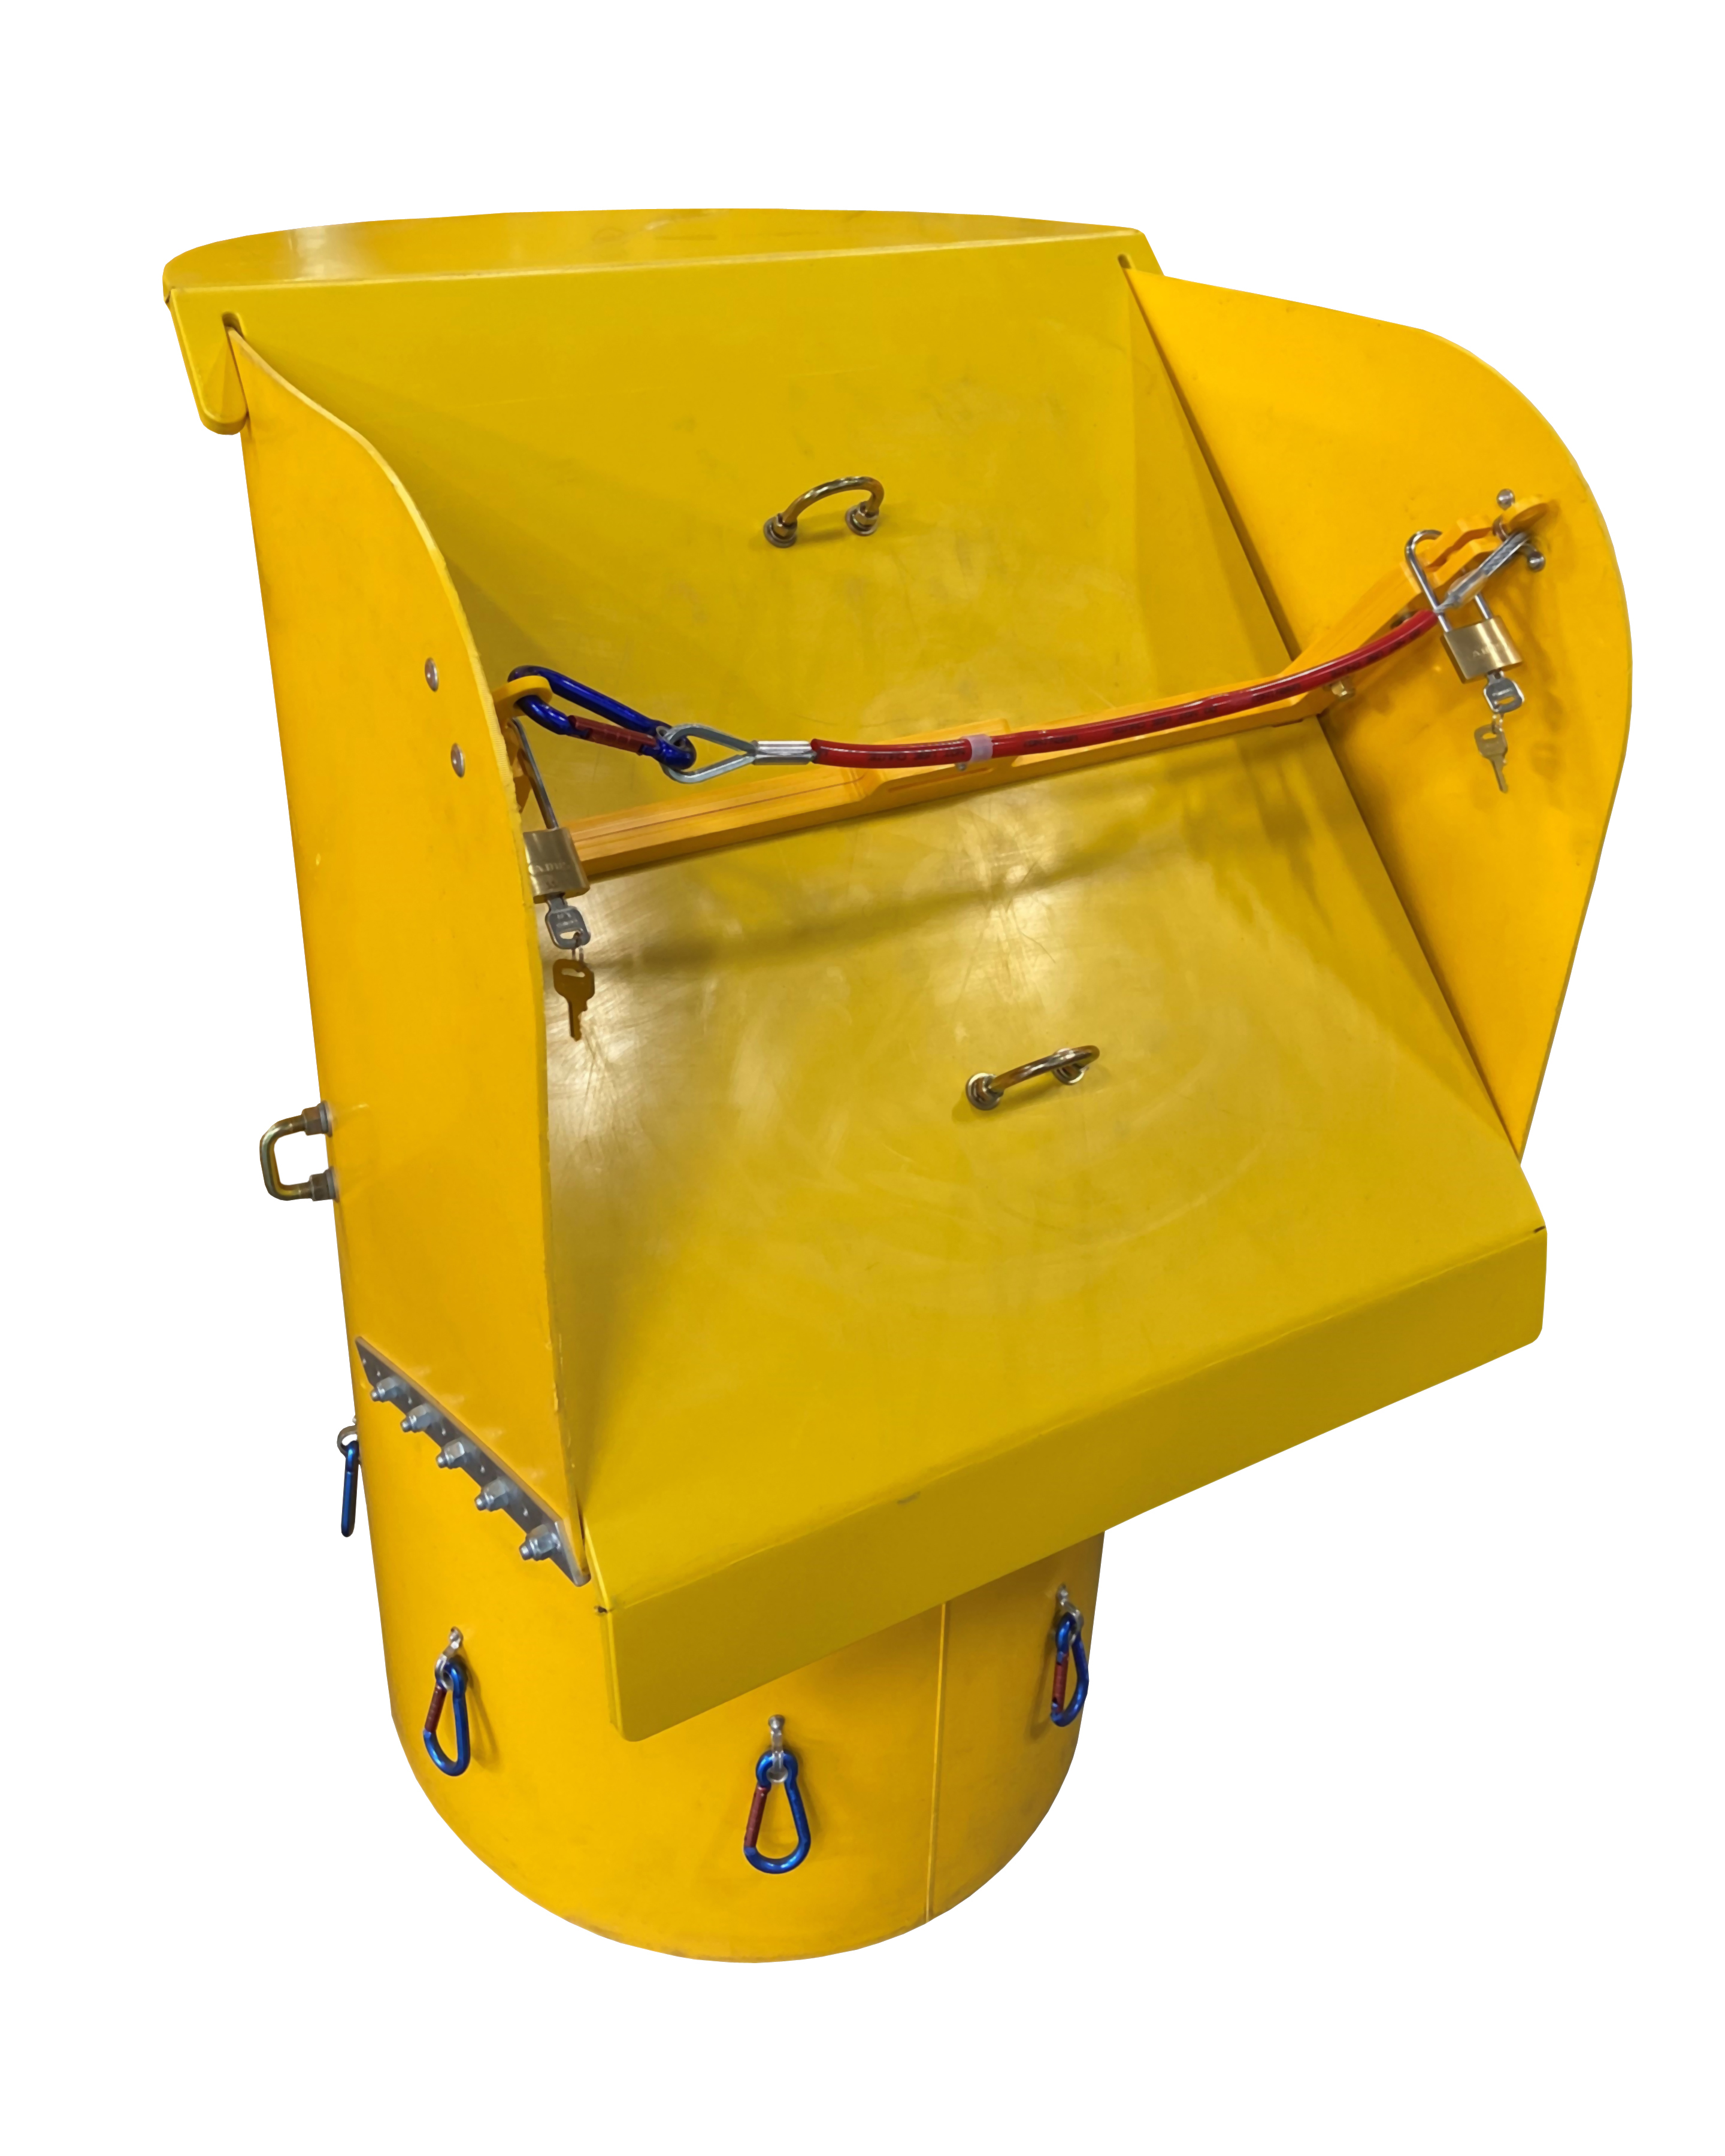 MATERIAL HANDLING & RIGGING   Trash Chutes   Top Hopper